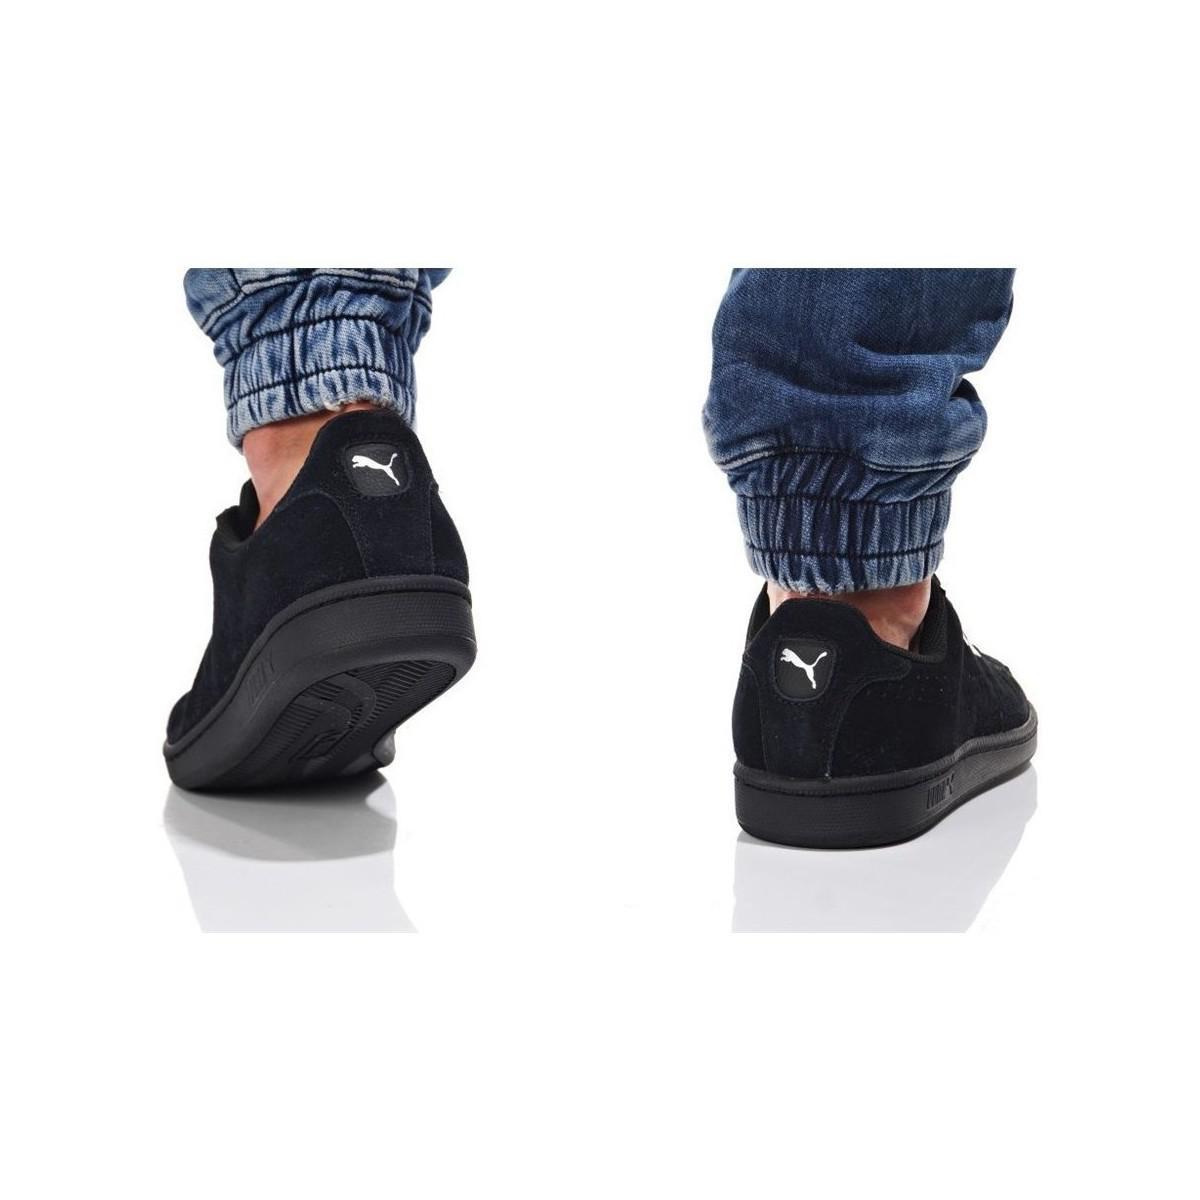 PUMA Smash Perf Sd Men's Shoes